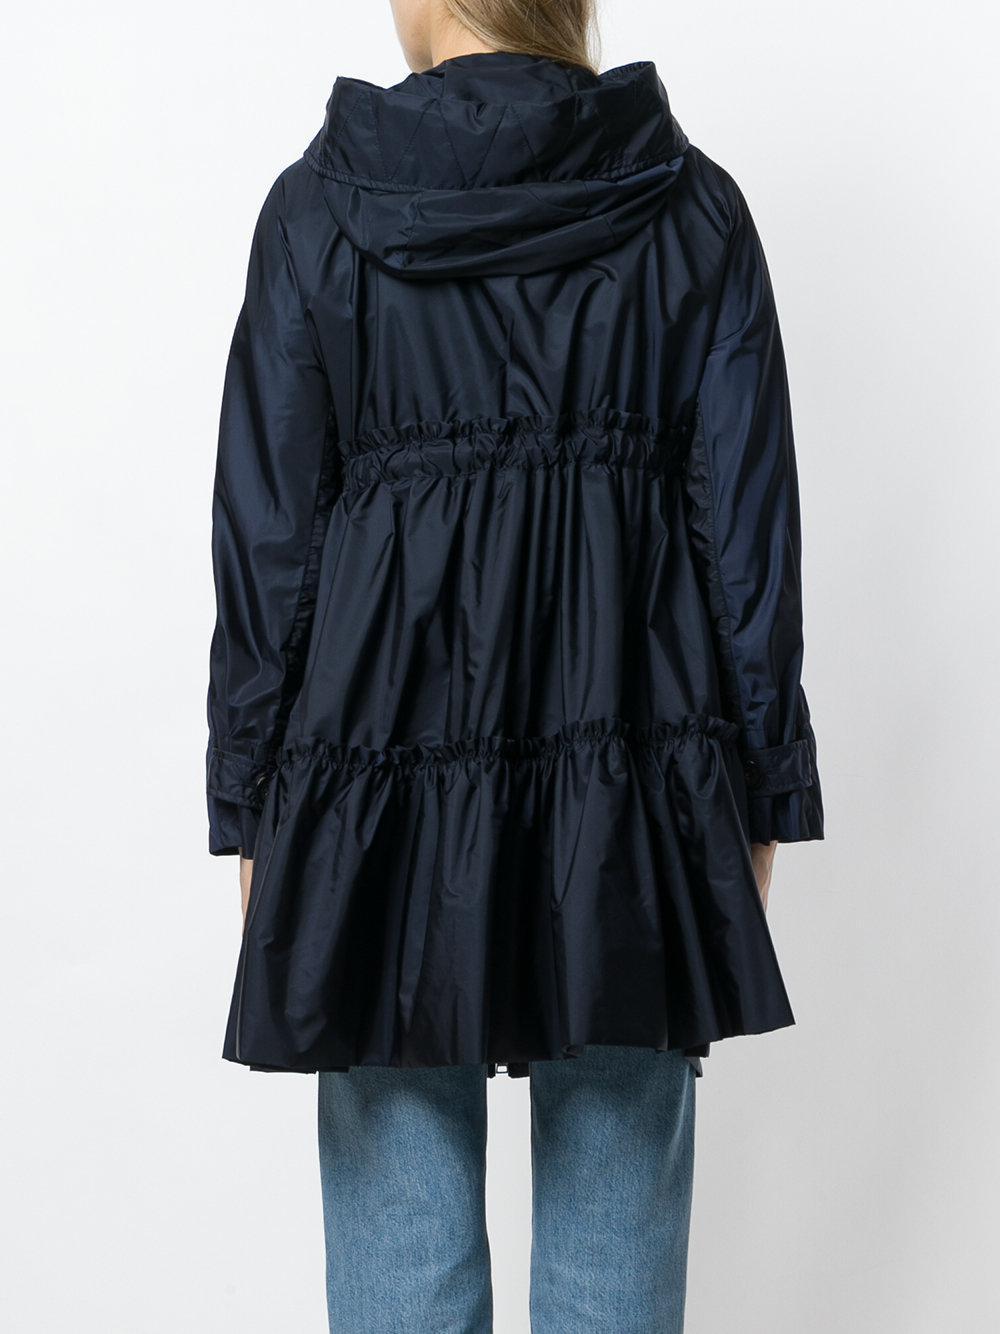 moncler turquoise coat